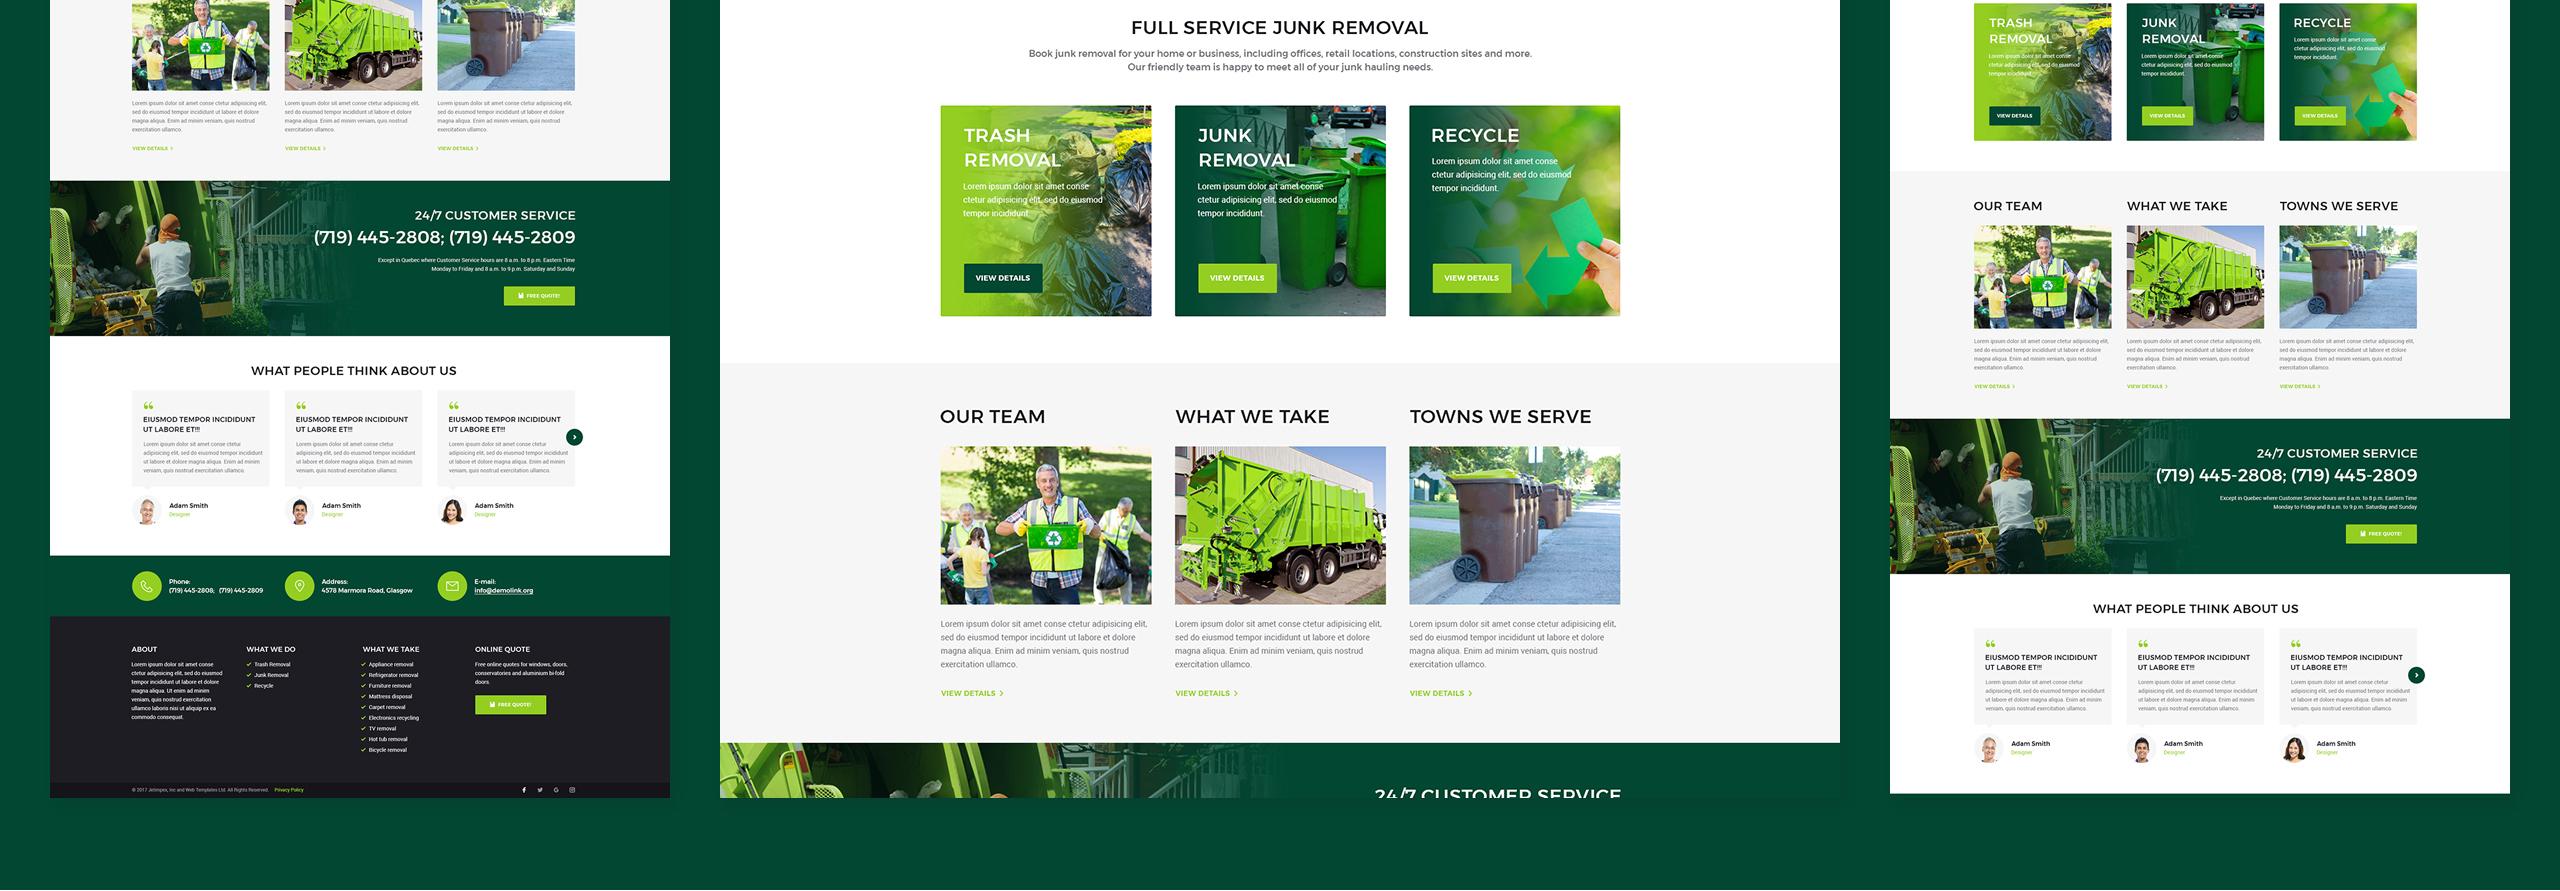 Website Design Template 66224 - junk rubbish waste dumpster trash service pickup responsive premium seo html testimonials woocommerce promotion blog